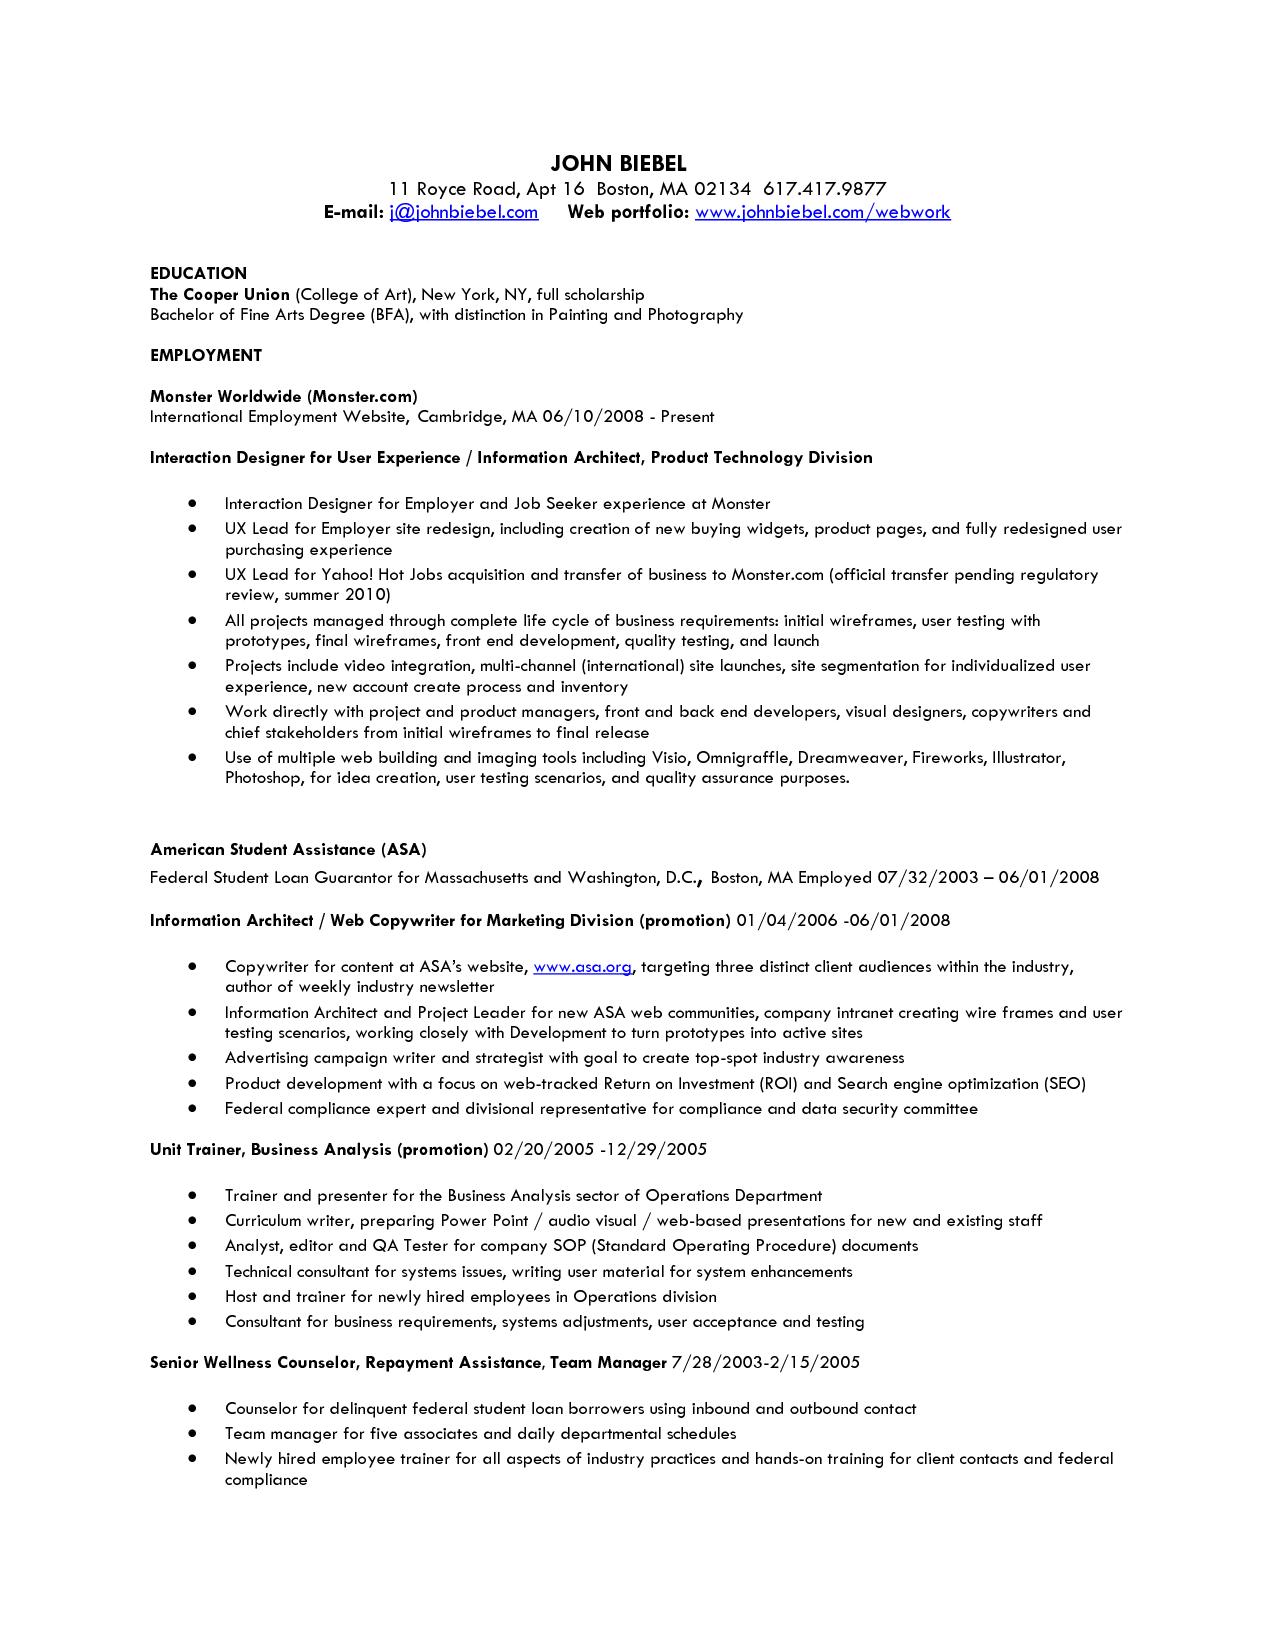 011 House Painter Job Description Employment Essay Impressive Descriptive Topics College Example About A Pet Full